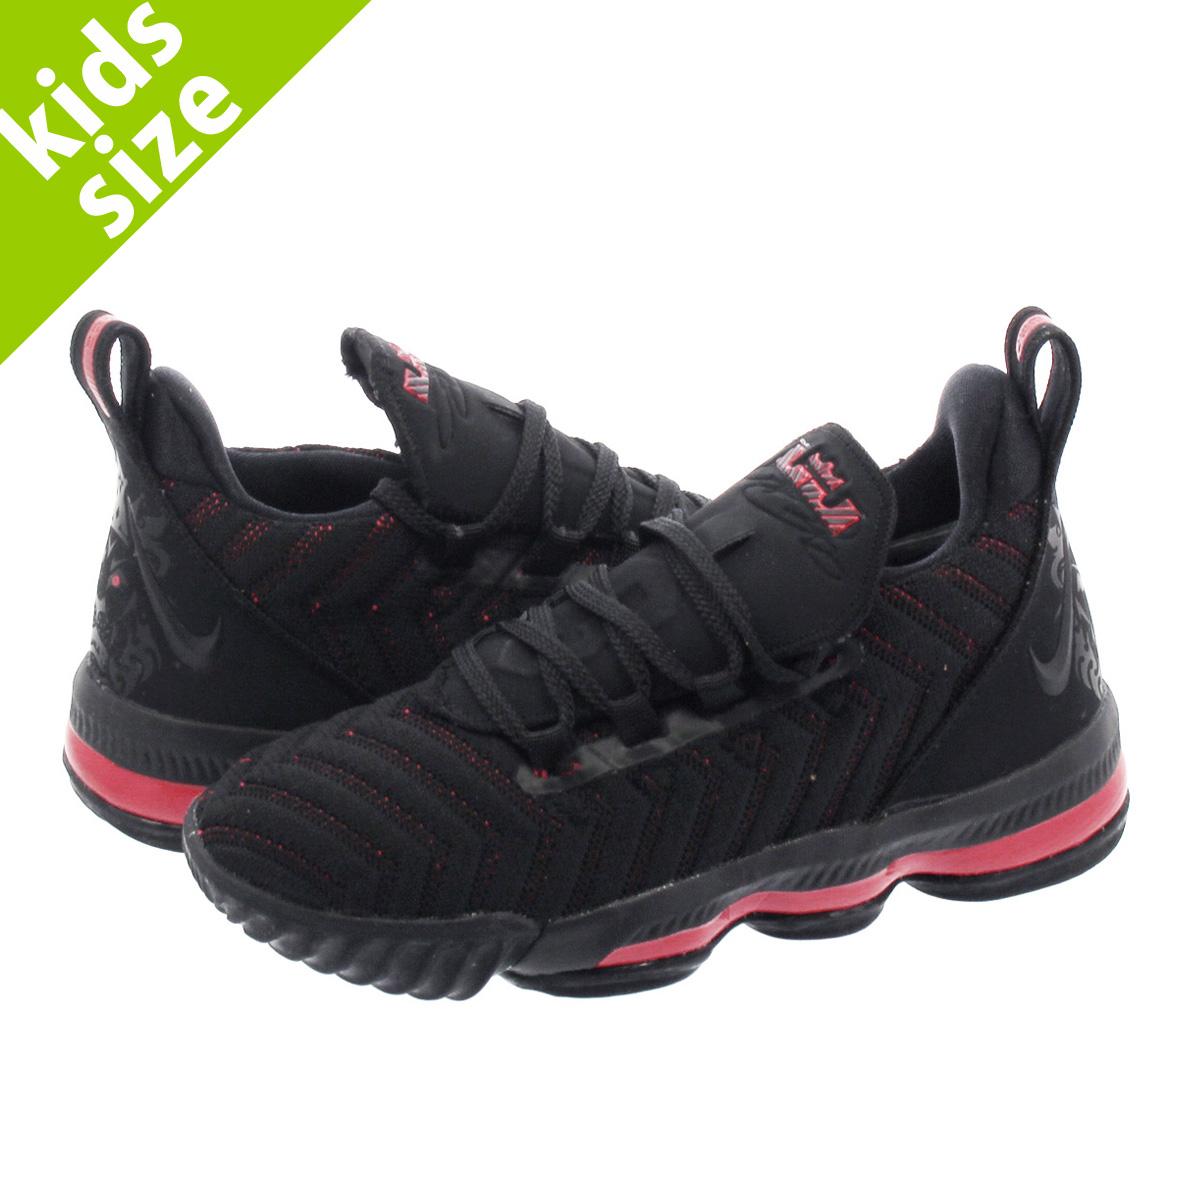 first rate b395c 914ec NIKE LEBRON 16 PS Nike Revlon 16 PS BLACK/UNIVERSITY RED aq2467-002